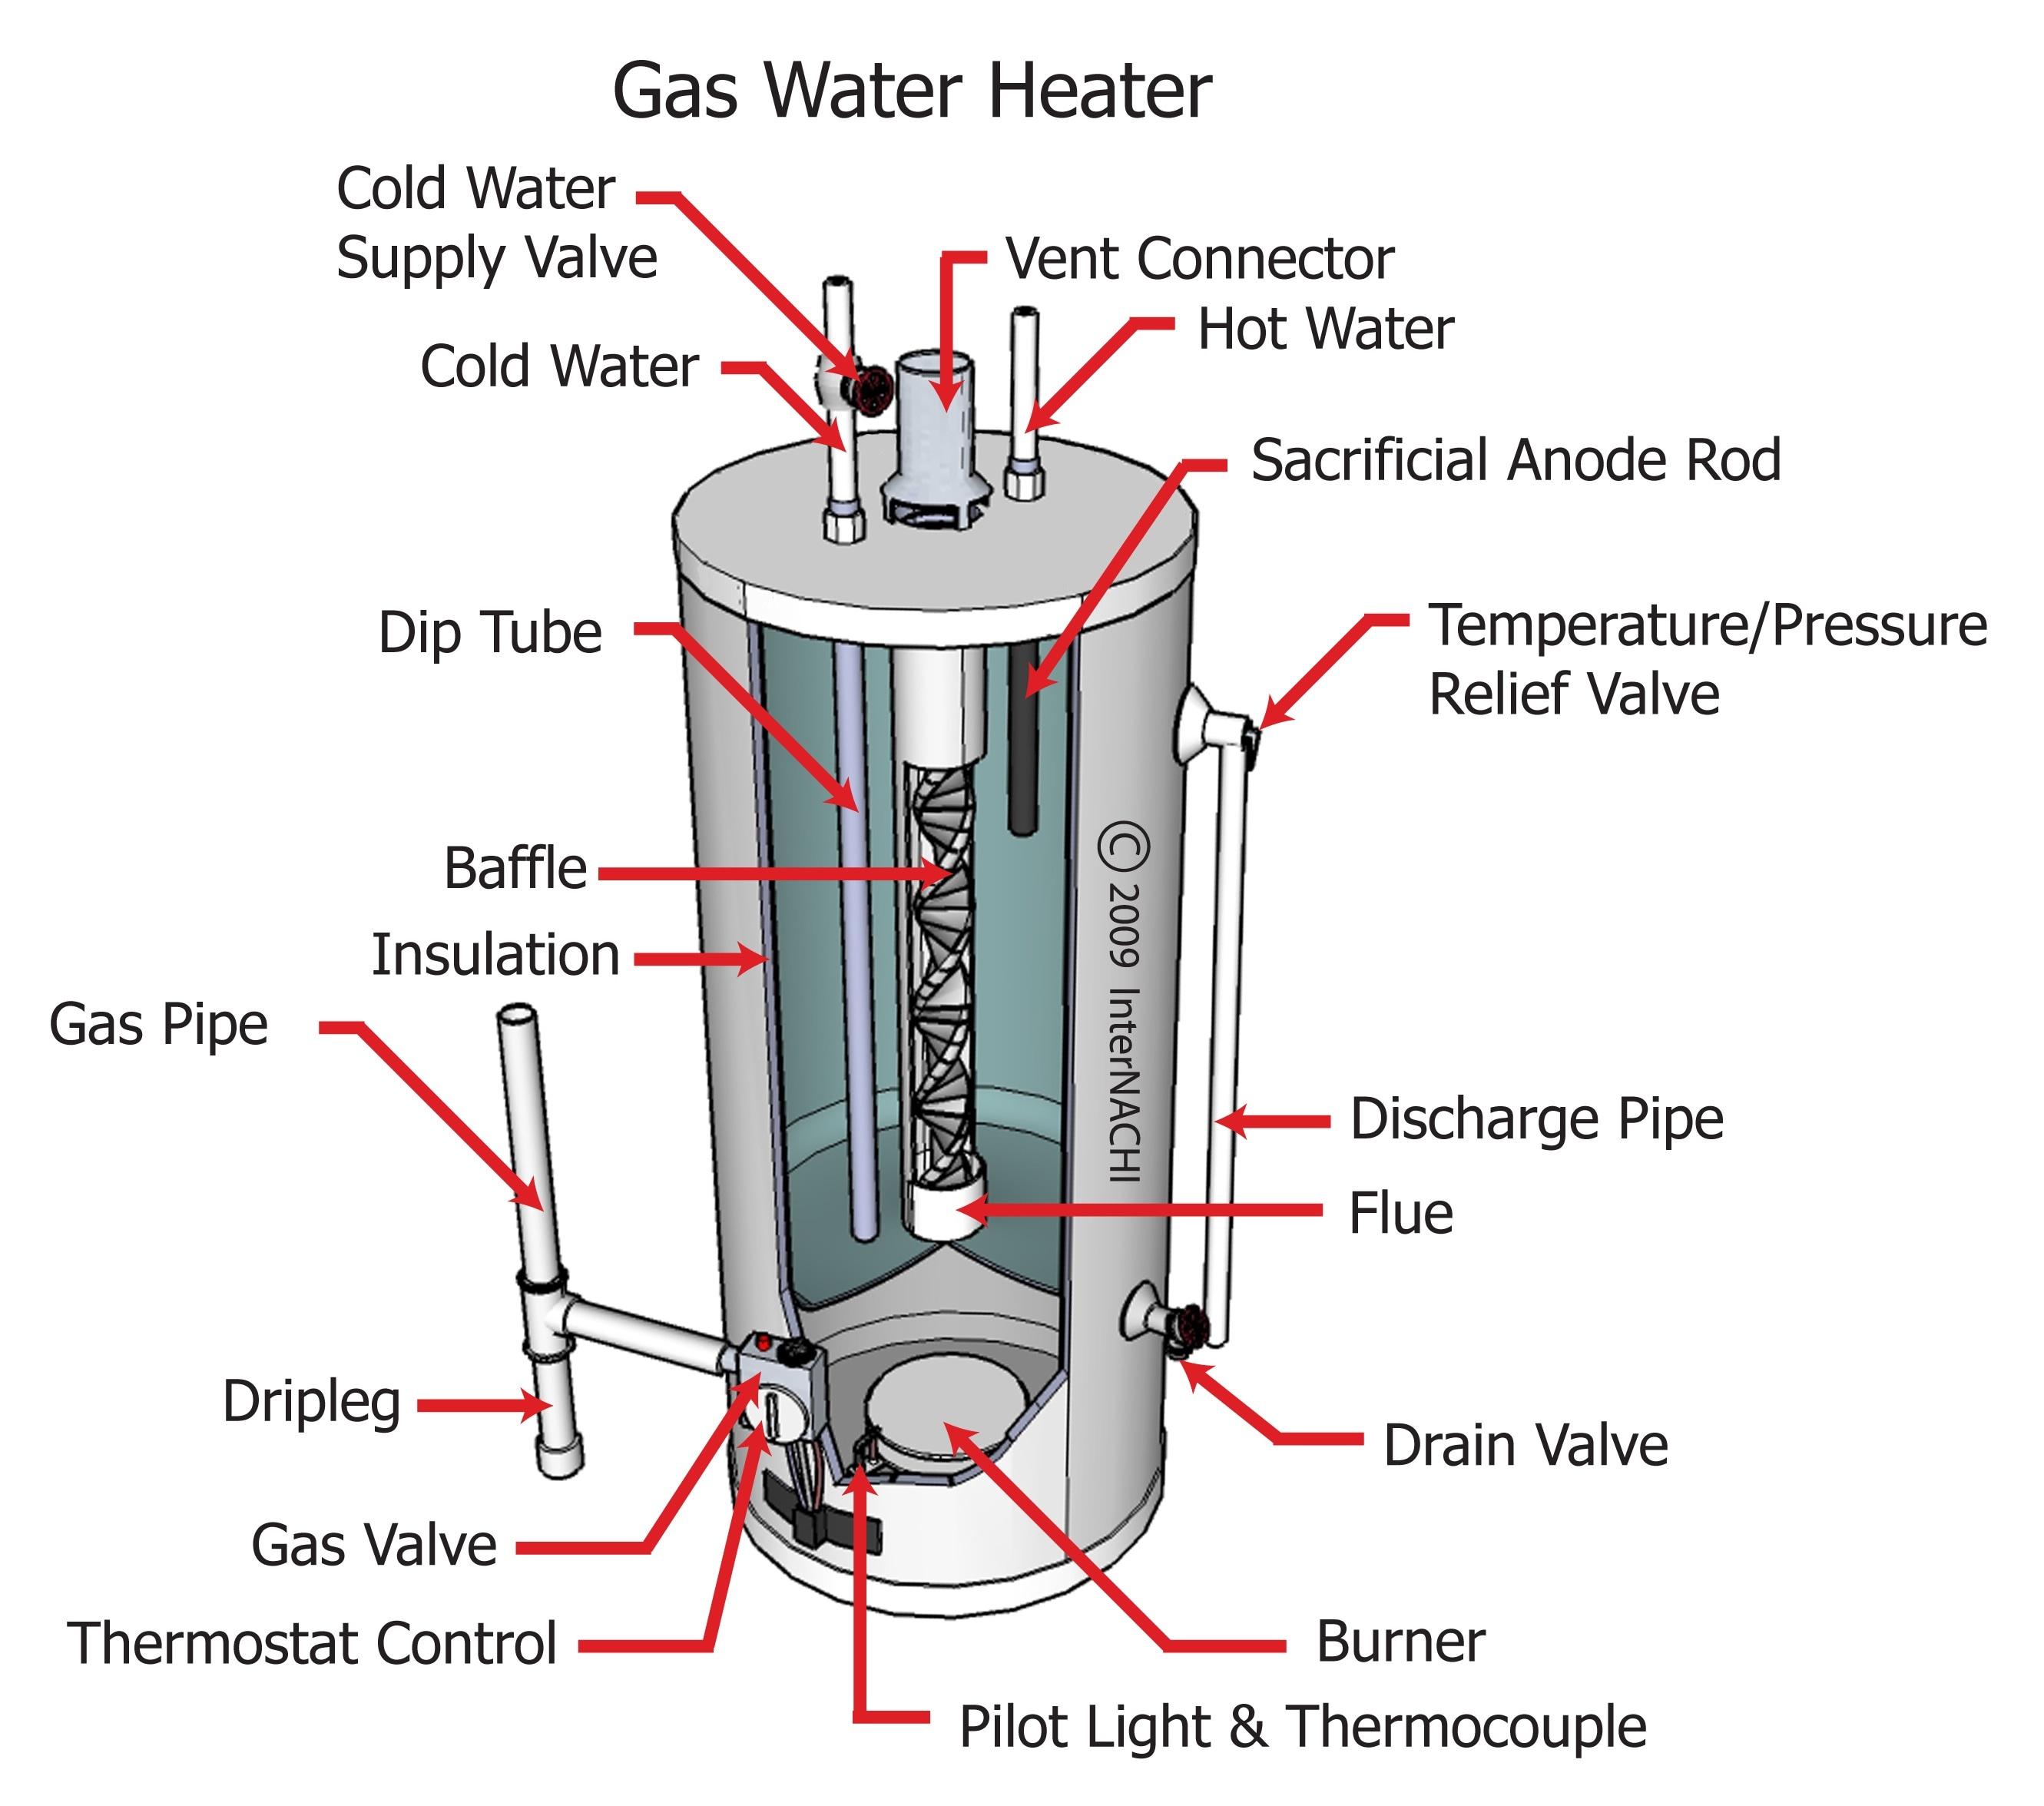 Gas water heater.